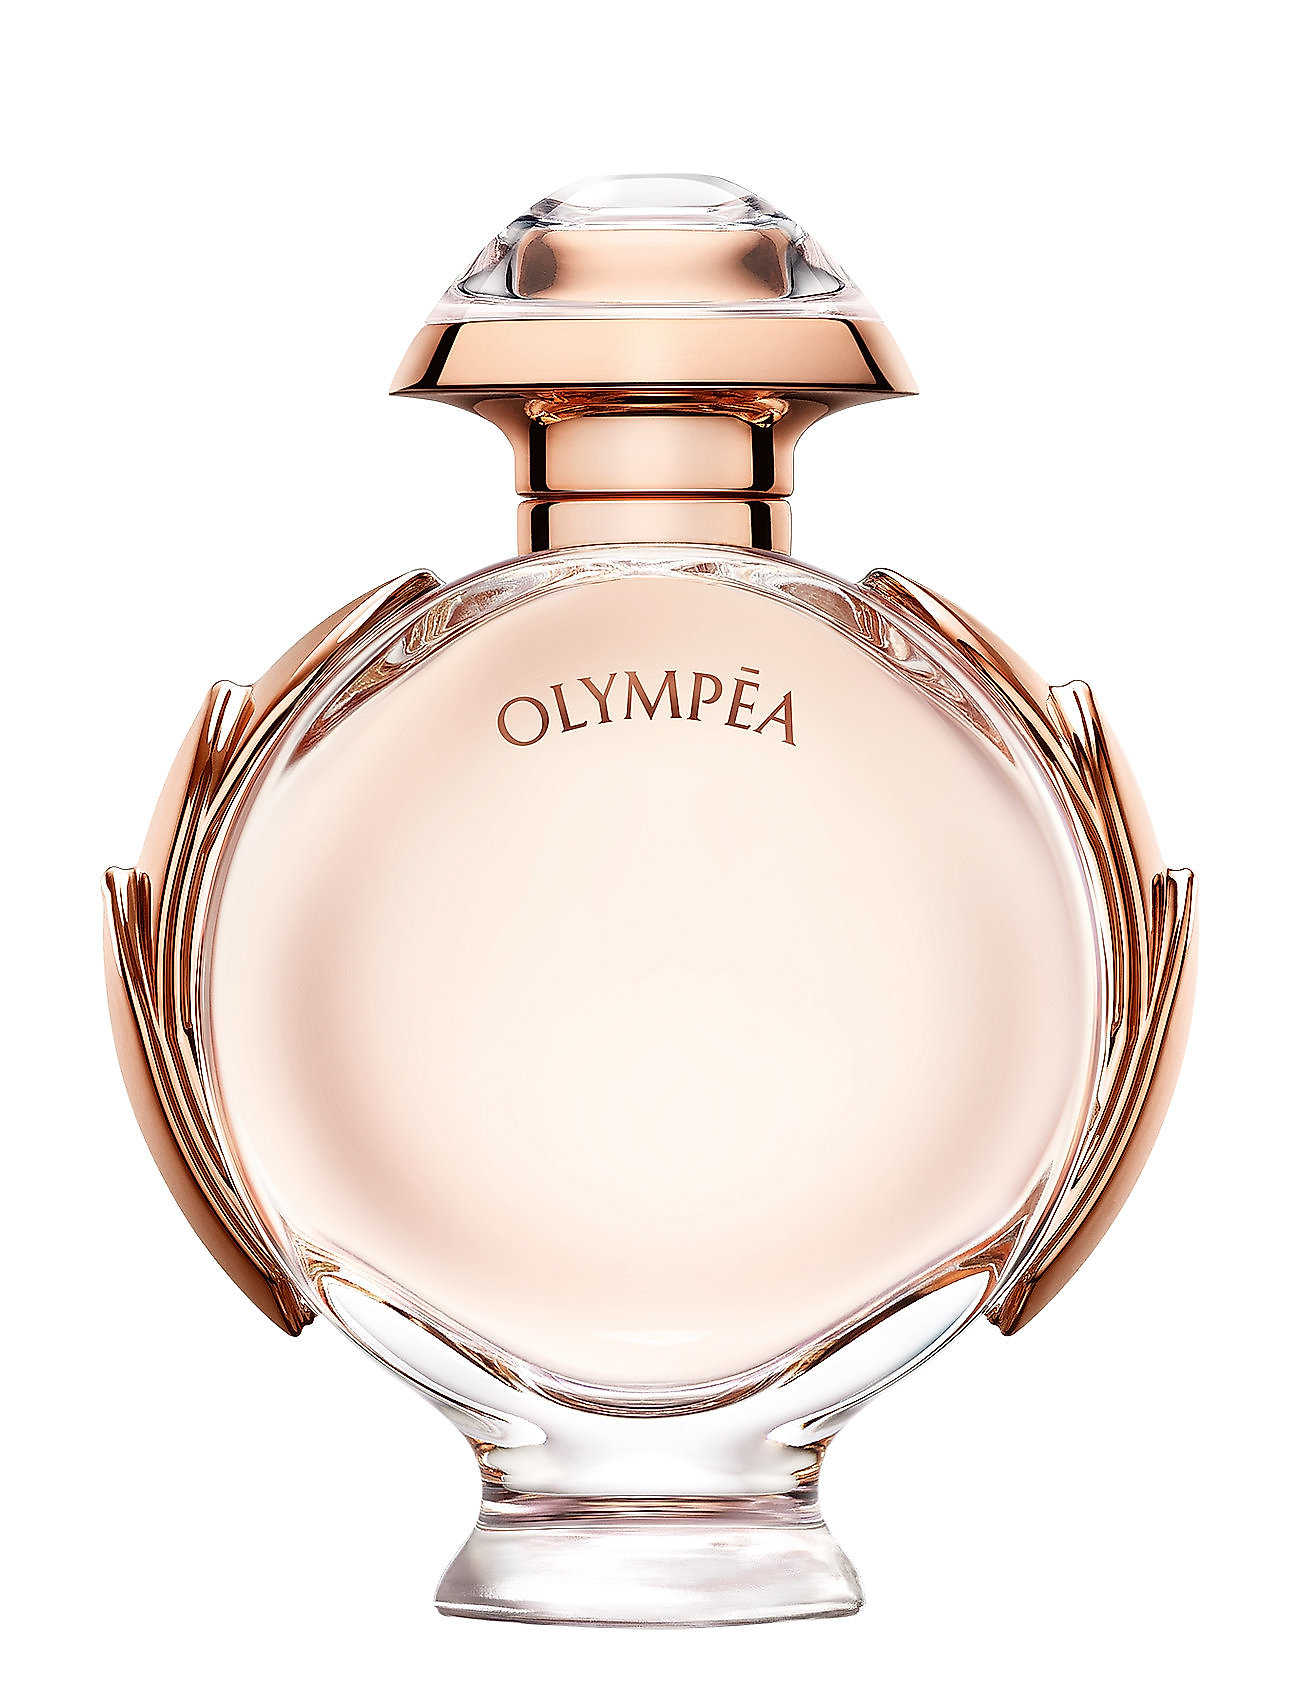 Paco rabanne olympea eau de parfum fra paco rabanne på boozt.com dk